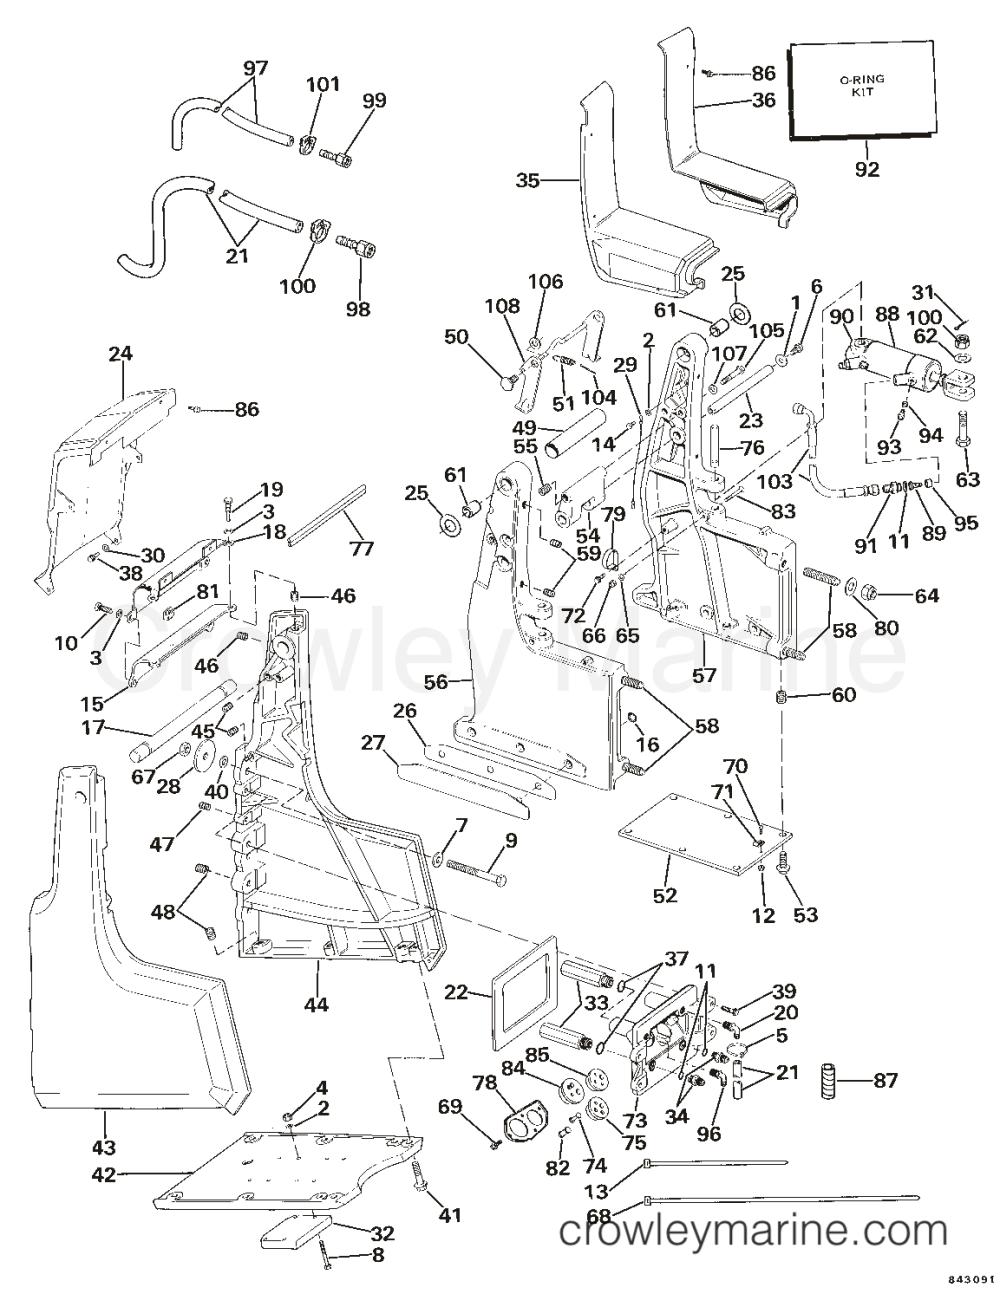 medium resolution of transom bracket assembly hydraulic steering 1984 omc sea drive omc wiring 1984 omc sea drive 1